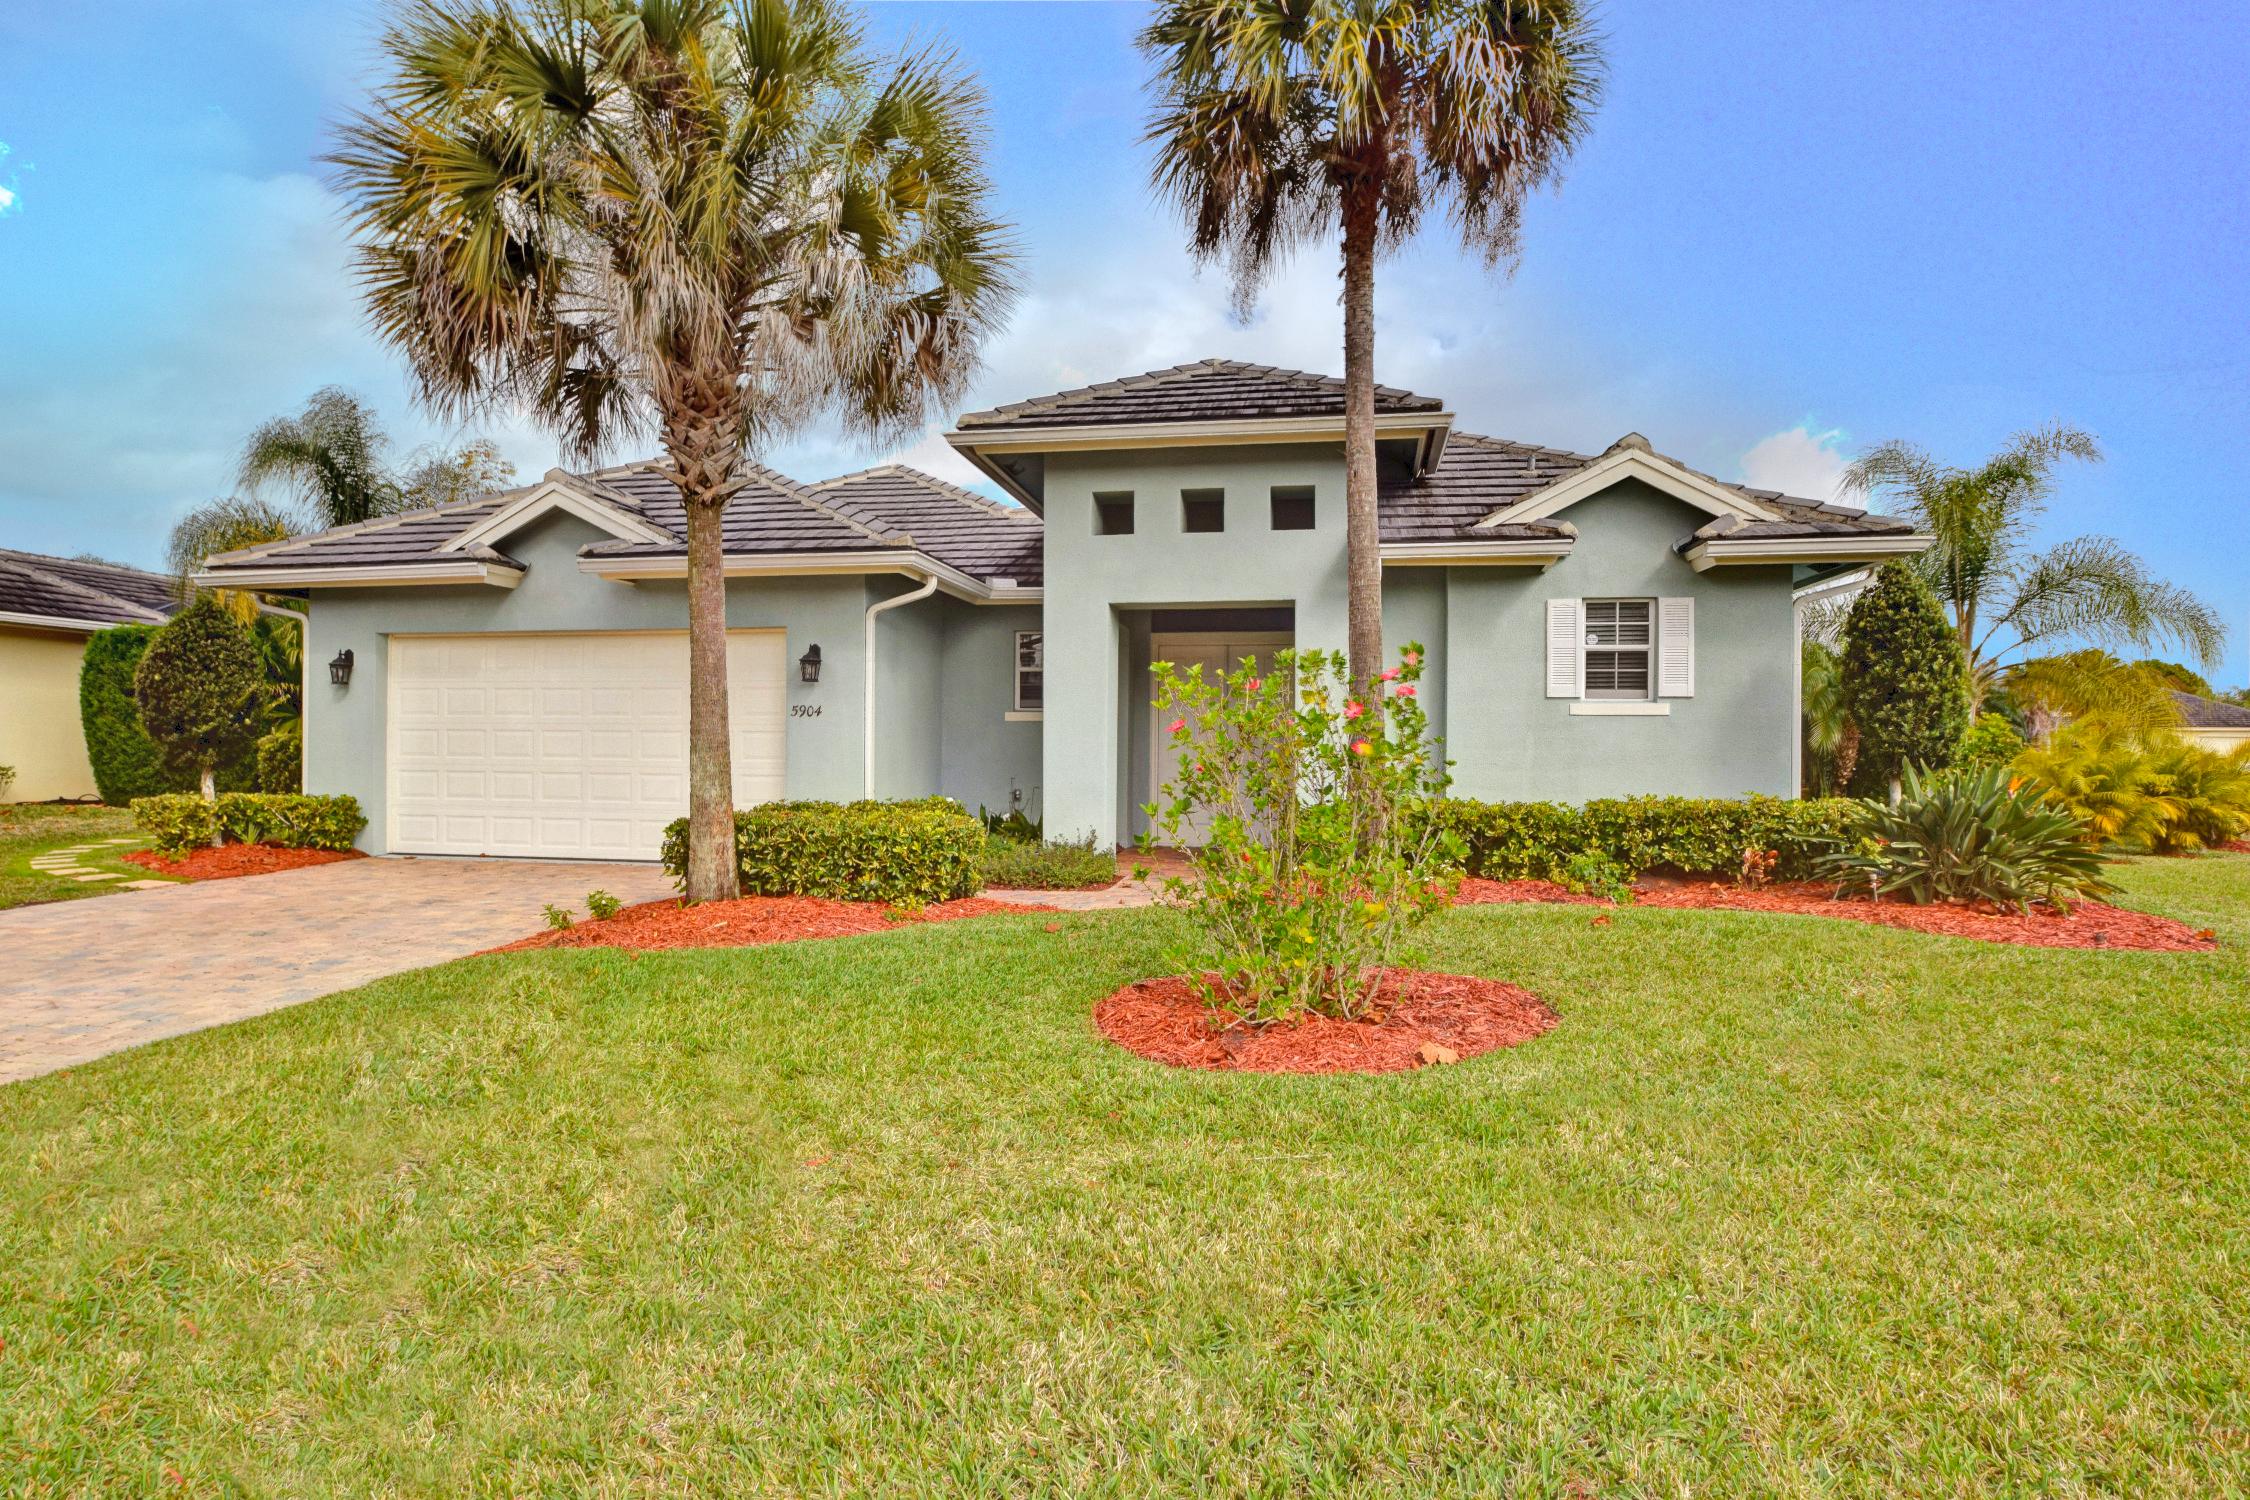 Single Family Home for Sale at Beautiful Brae Burn Estates Pool home 5904 Brae Burn Circle Vero Beach, Florida, 32967 United States